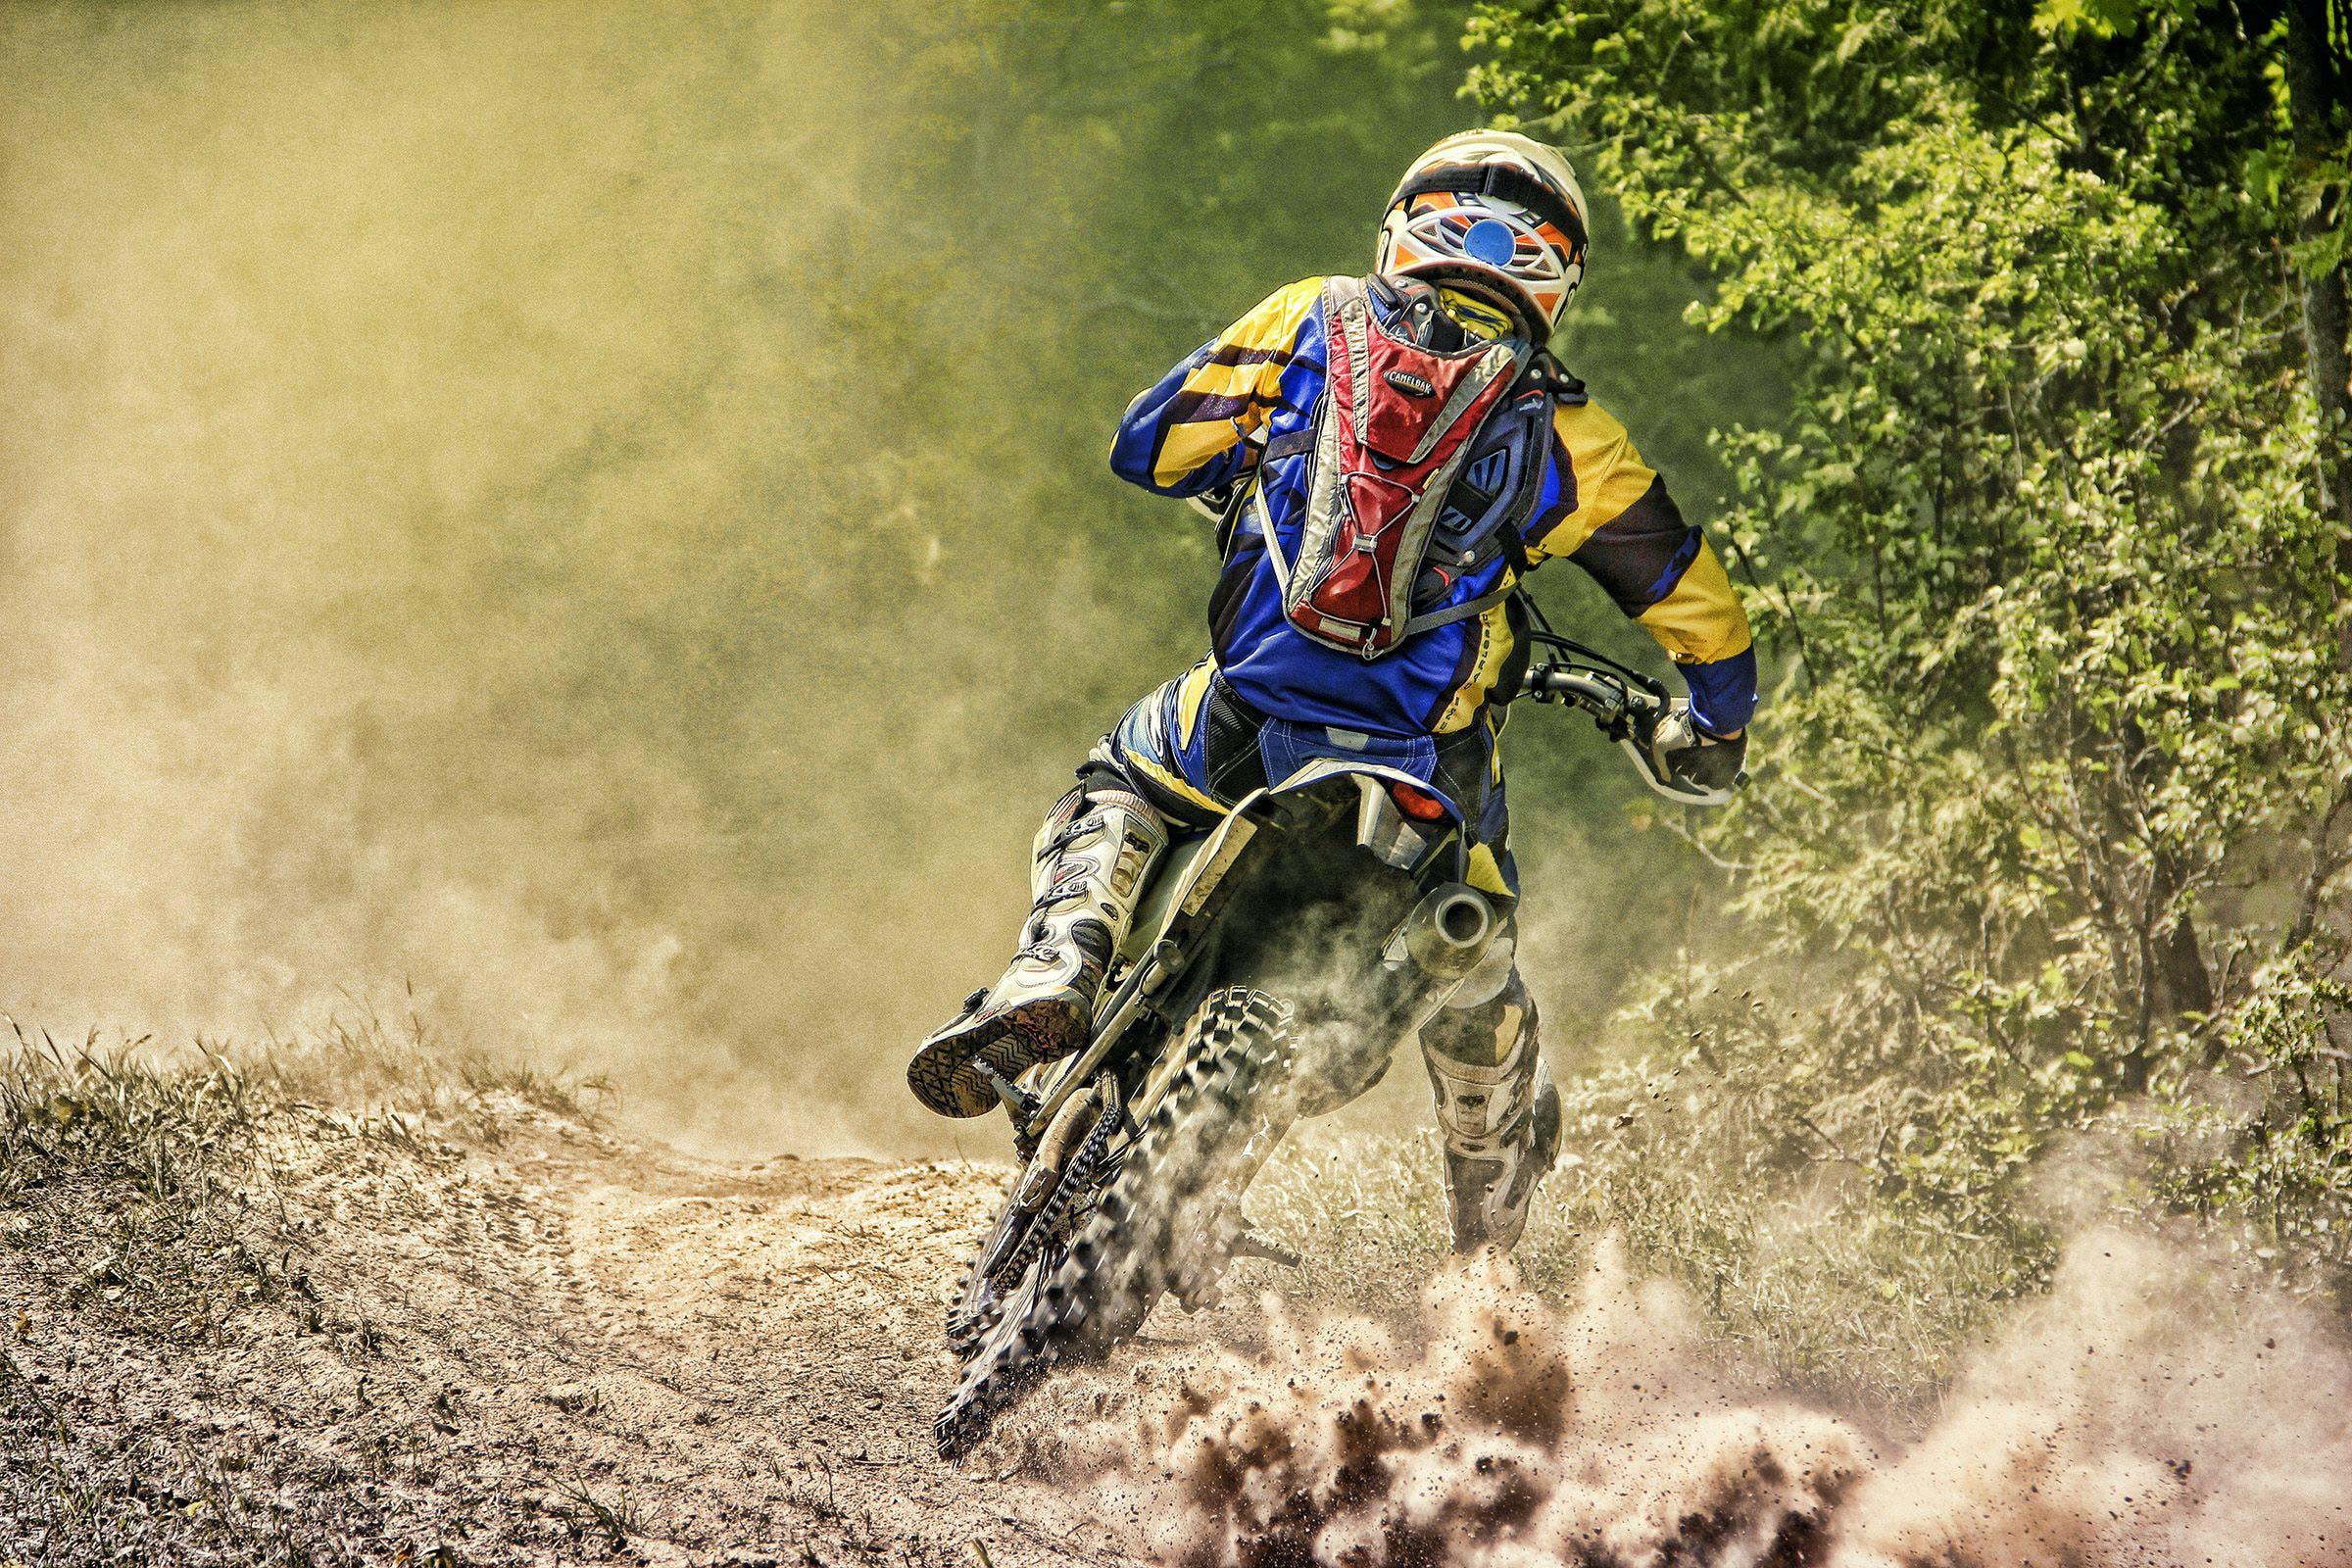 Free stock photo of dirt bike, dust, motorcycle, rider